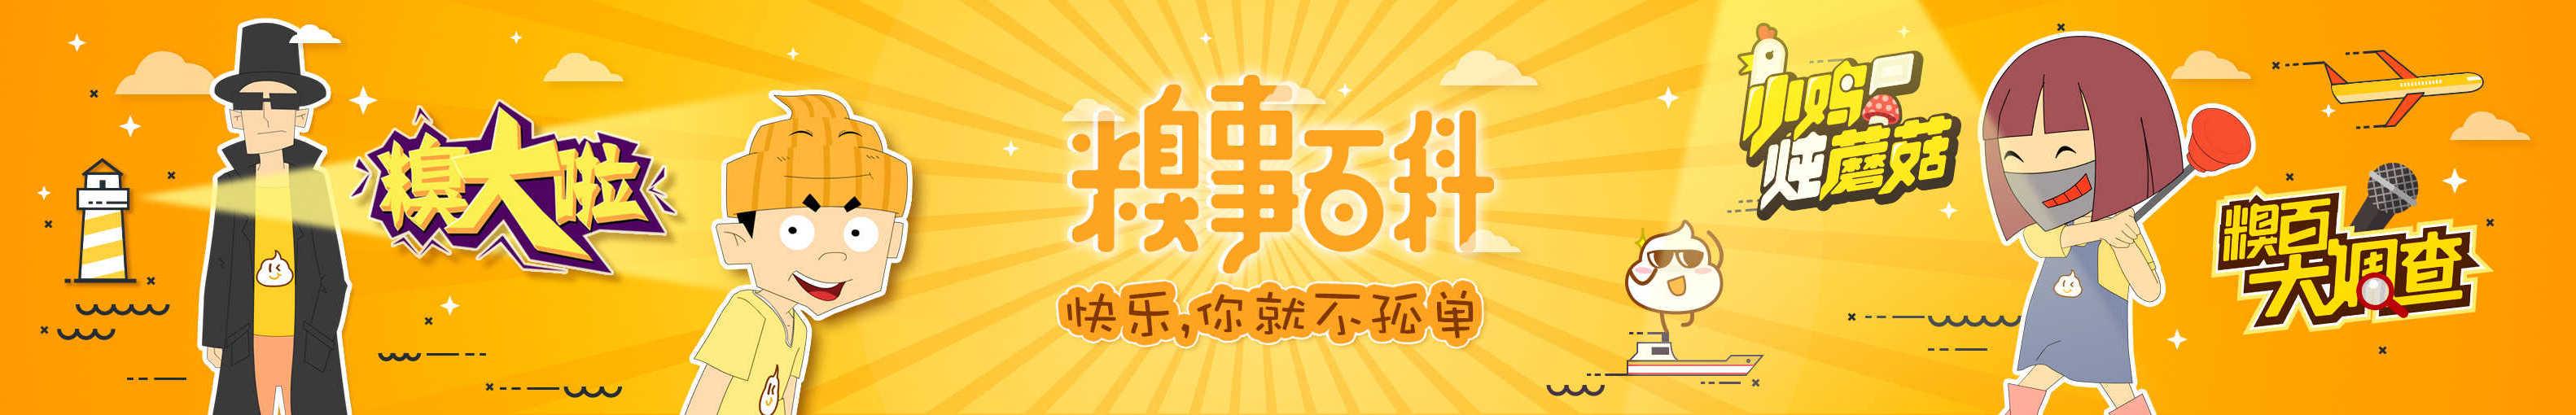 糗事百科 banner